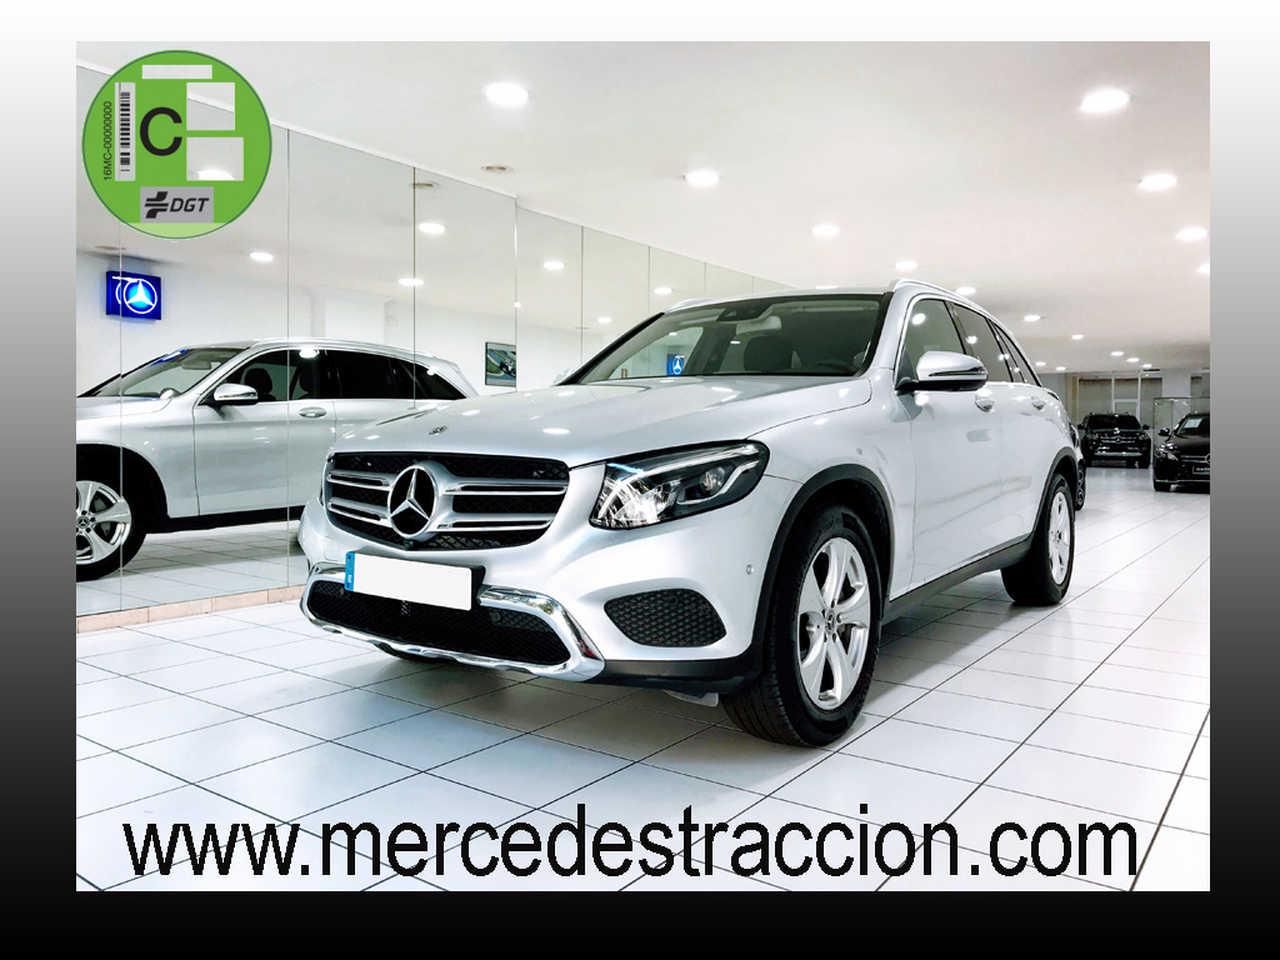 Mercedes GLC 220 d 4Matic/9 G/Camara  360º/Comand   - Foto 1